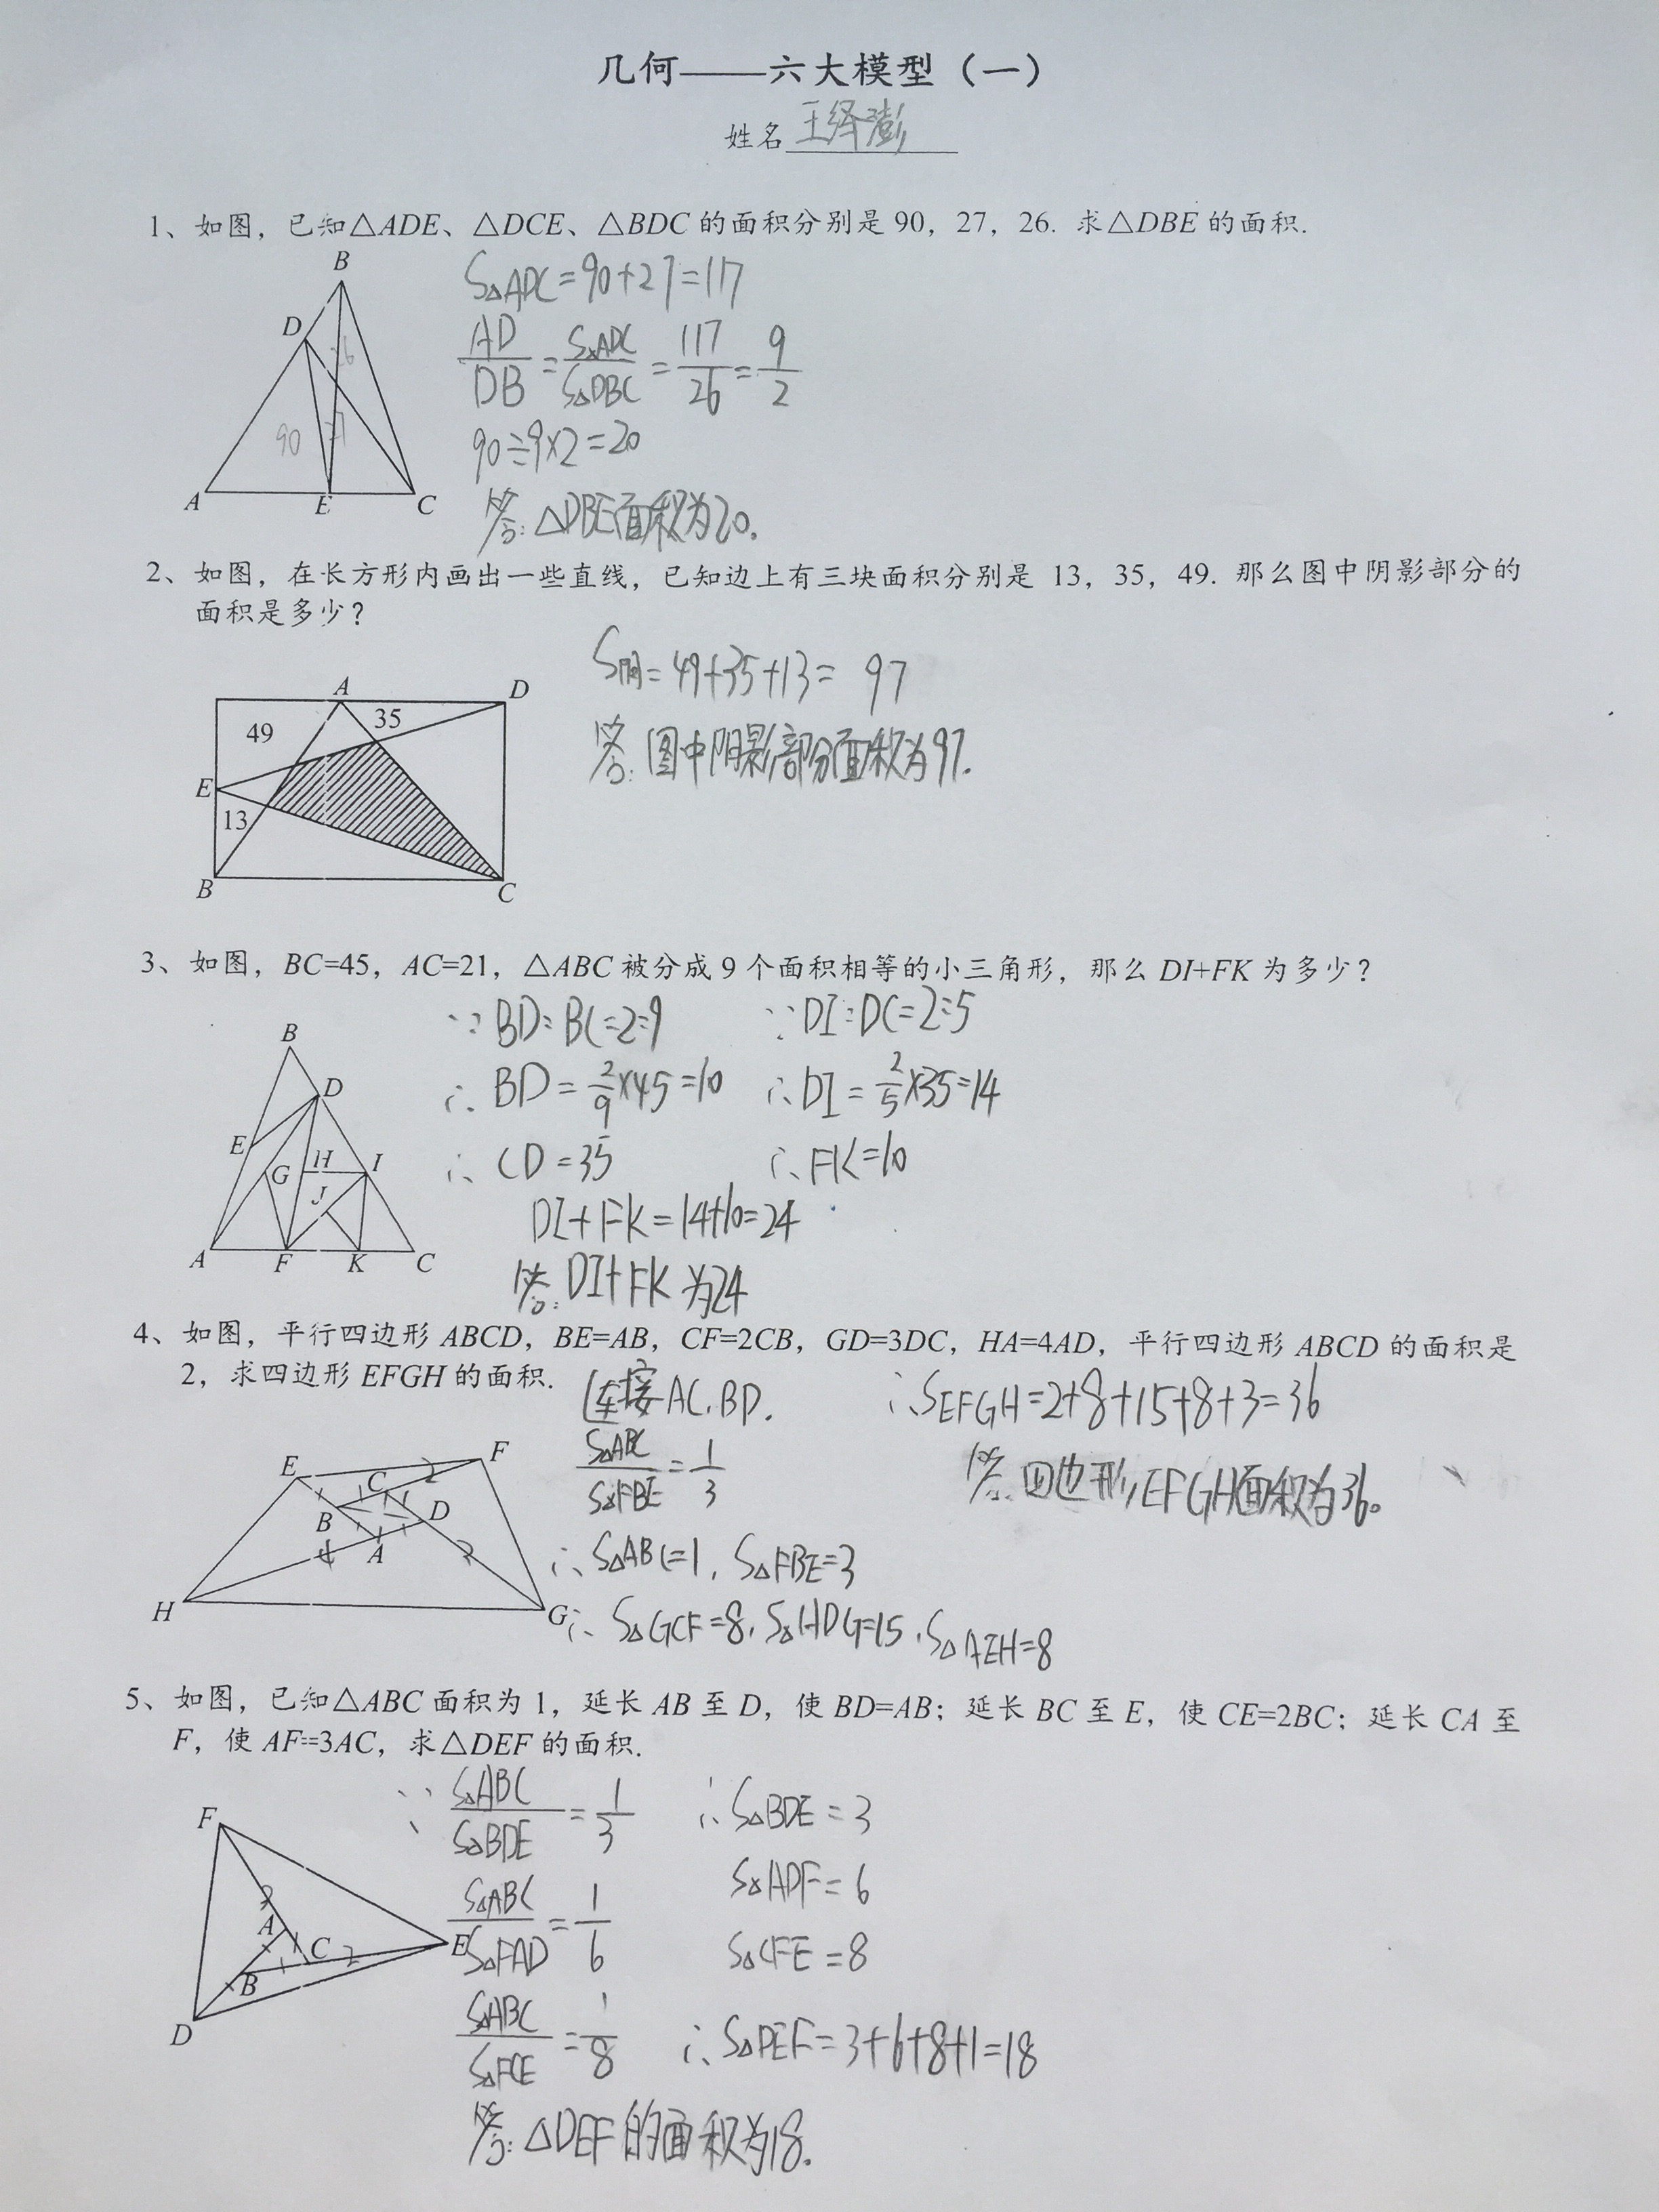 6C509394-C787-4806-9101-33DFECD09E4F.jpg